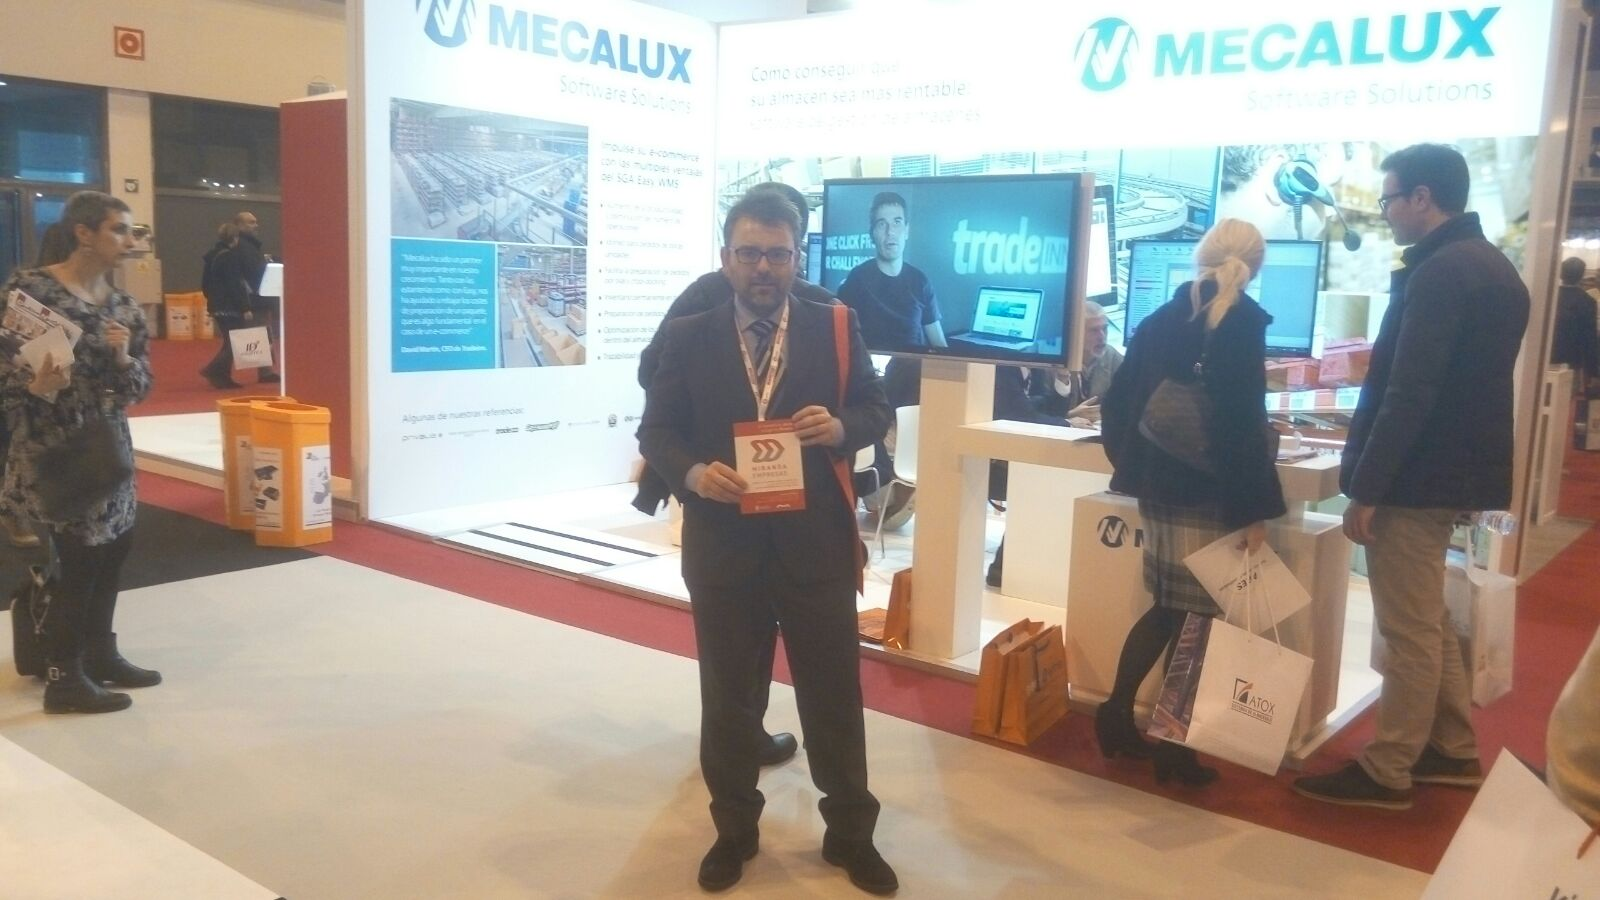 Miranda empresas asiste a la feria logistics en madrid - Empresas interiorismo madrid ...